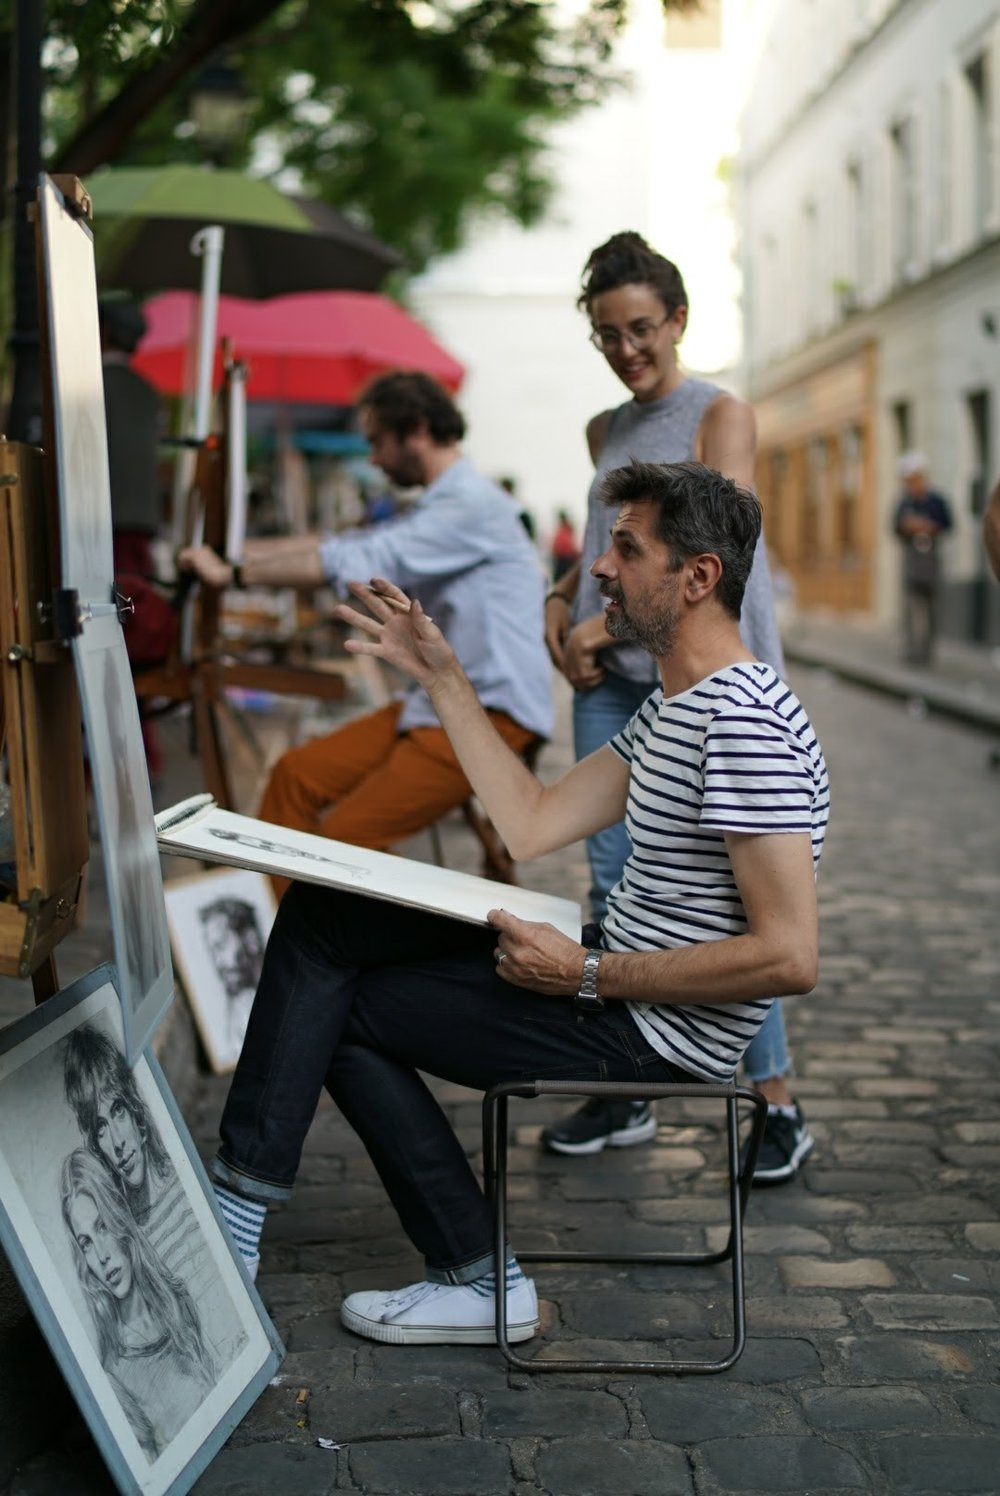 Artists near Sacre Coeur